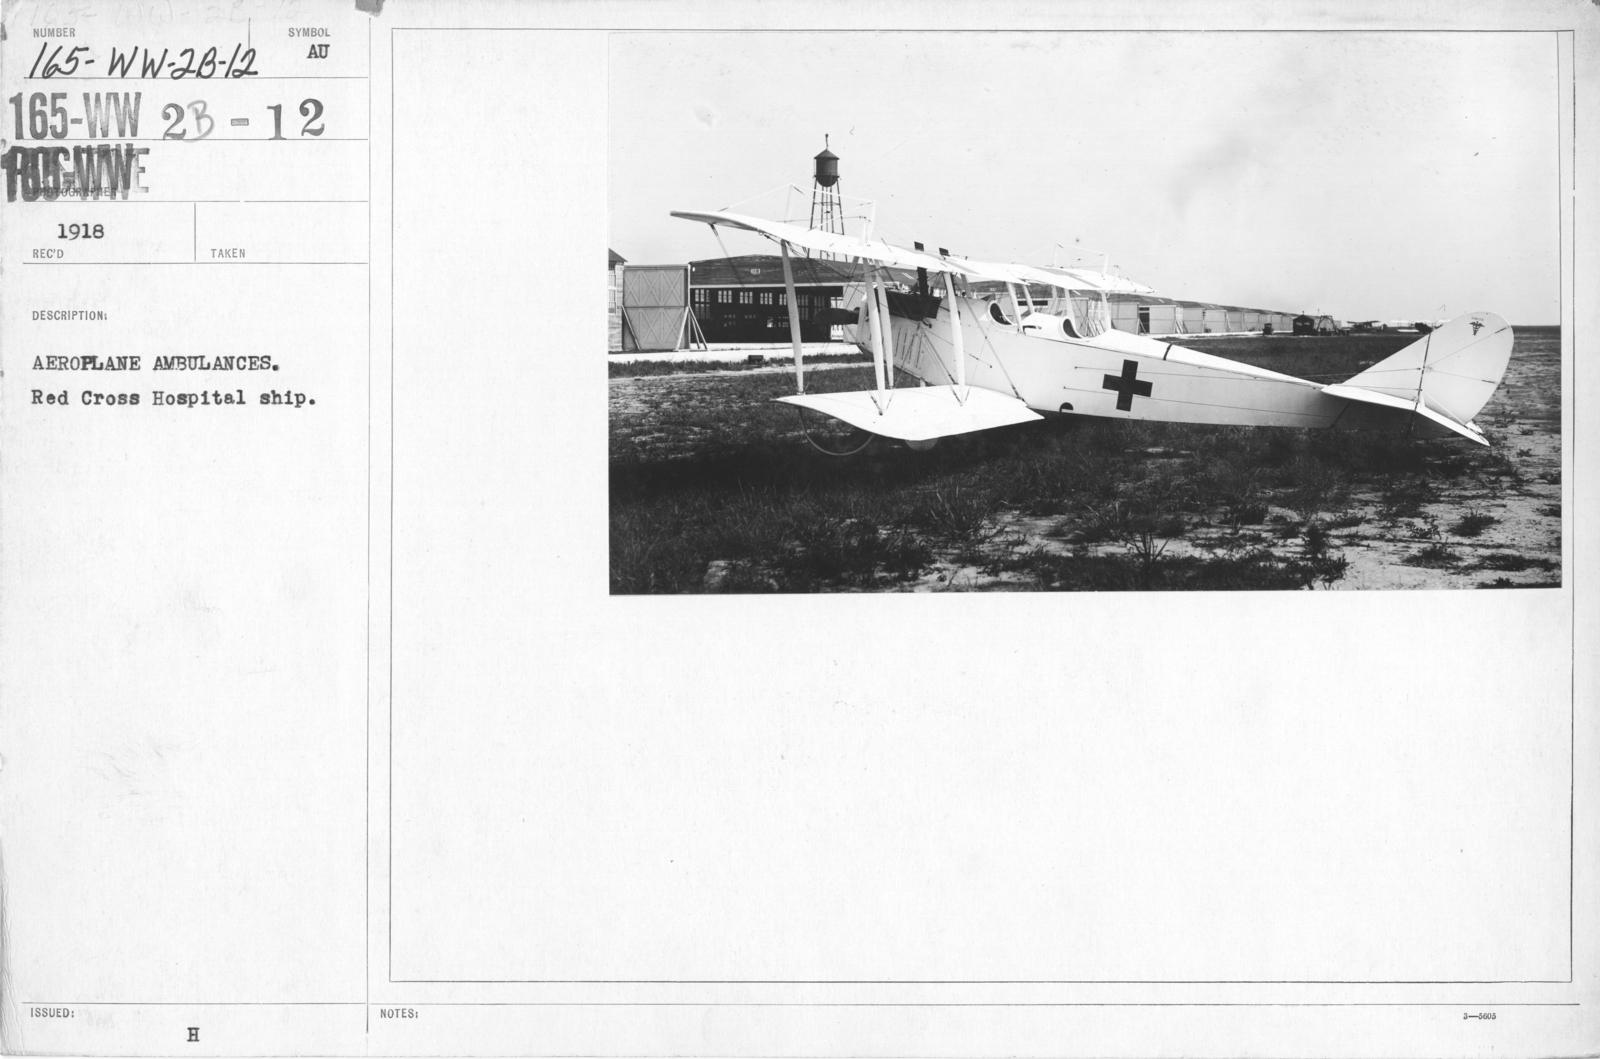 Airplanes - Ambulance - Aeroplane Ambulances. Red Cross Hospital ship